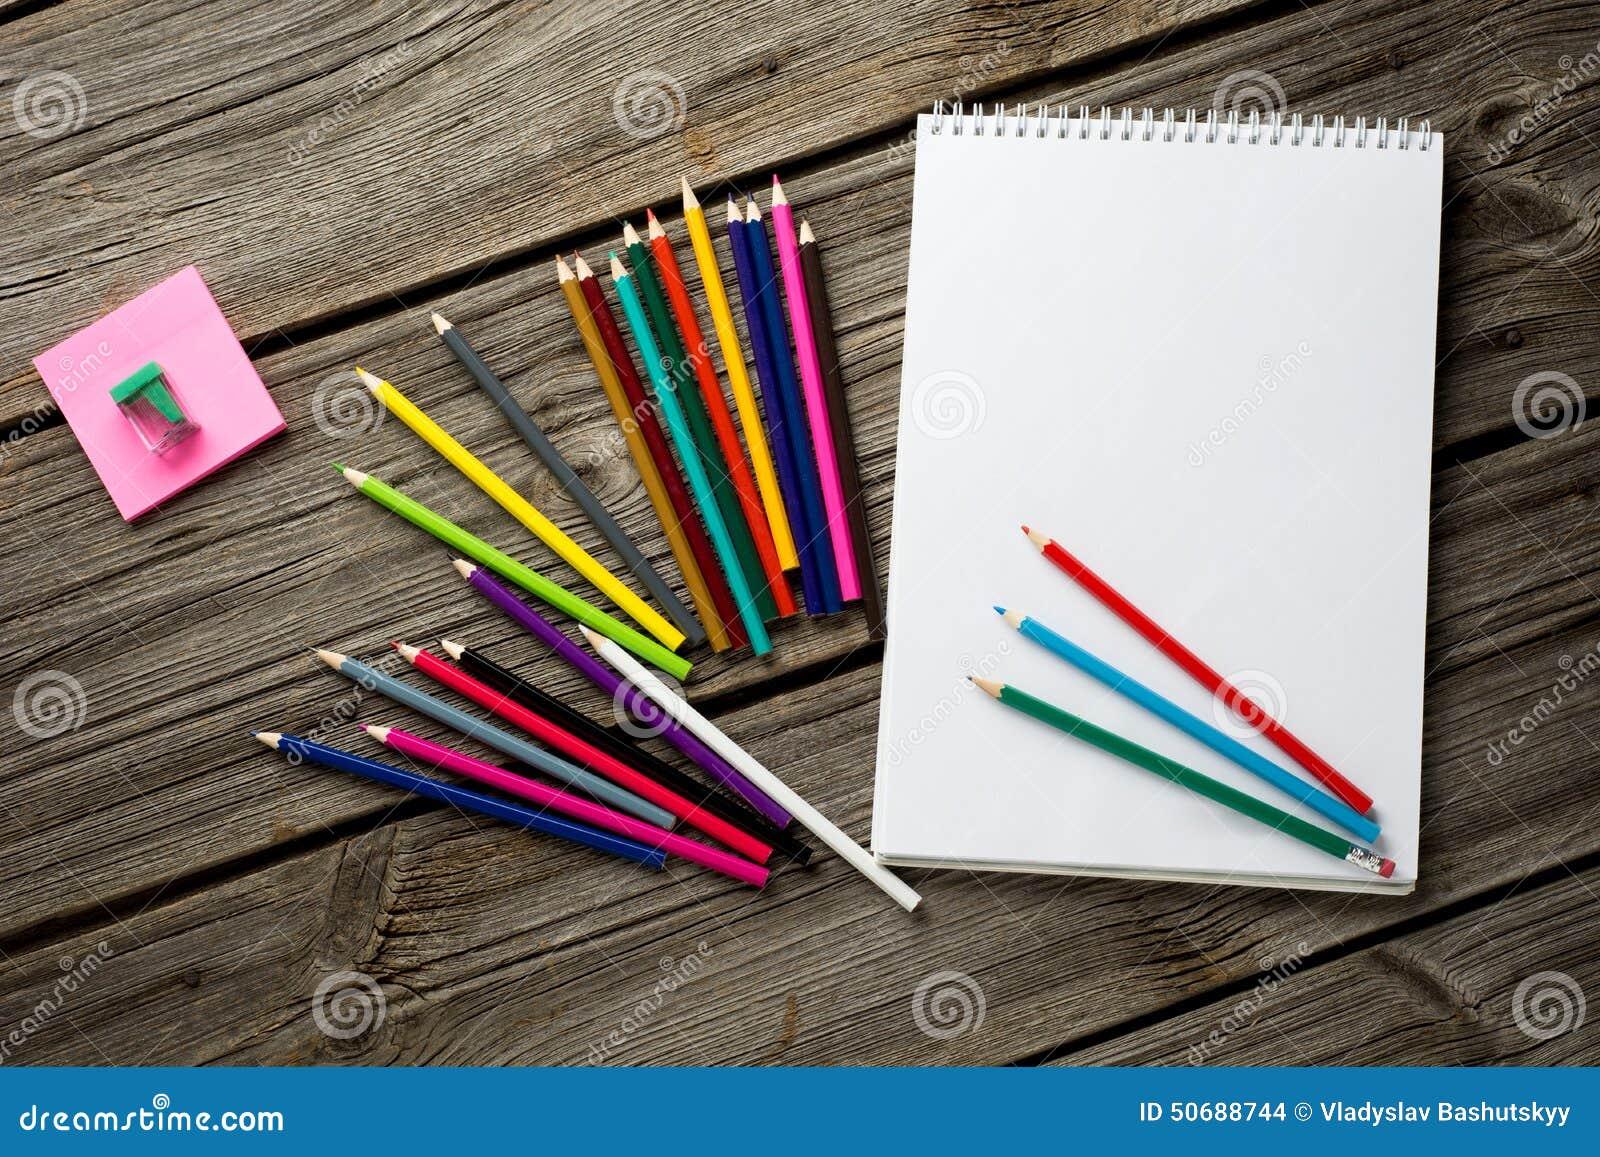 Download 与色的铅笔和笔记本的工作区在老 库存照片. 图片 包括有 切记, 消息, 纸张, 影片, 写道, 杯子, 便条 - 50688744